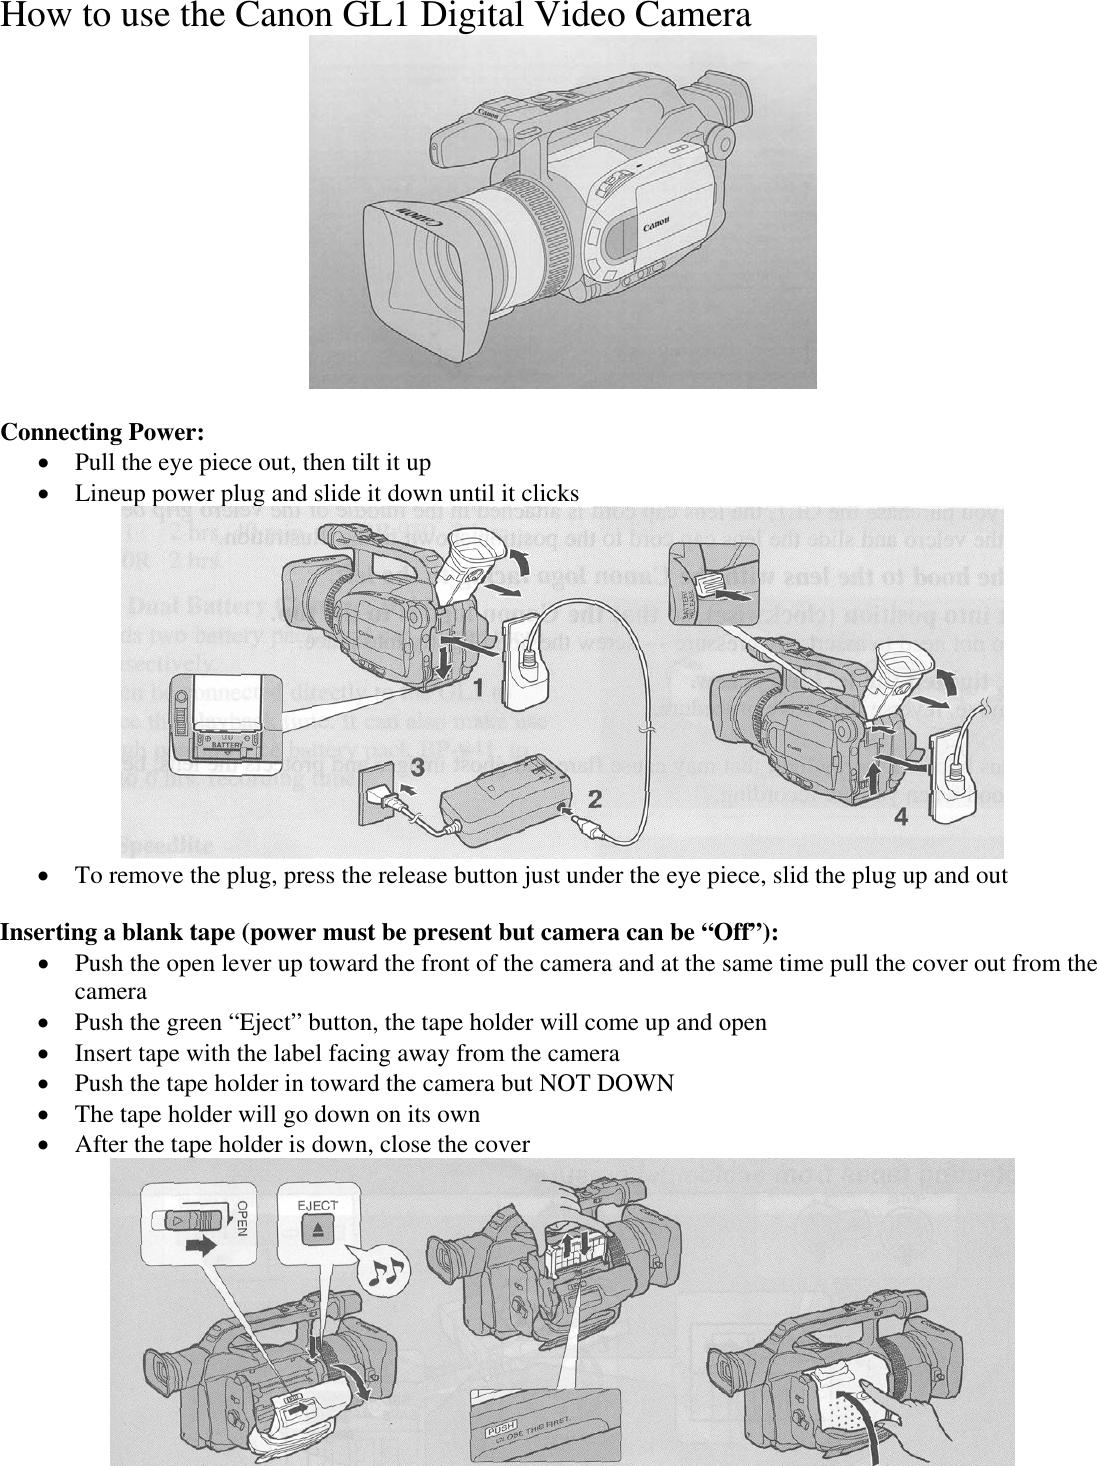 canon gl1 users manual how to use the digital video camera rh usermanual wiki Canon GL1 GL1 Gun